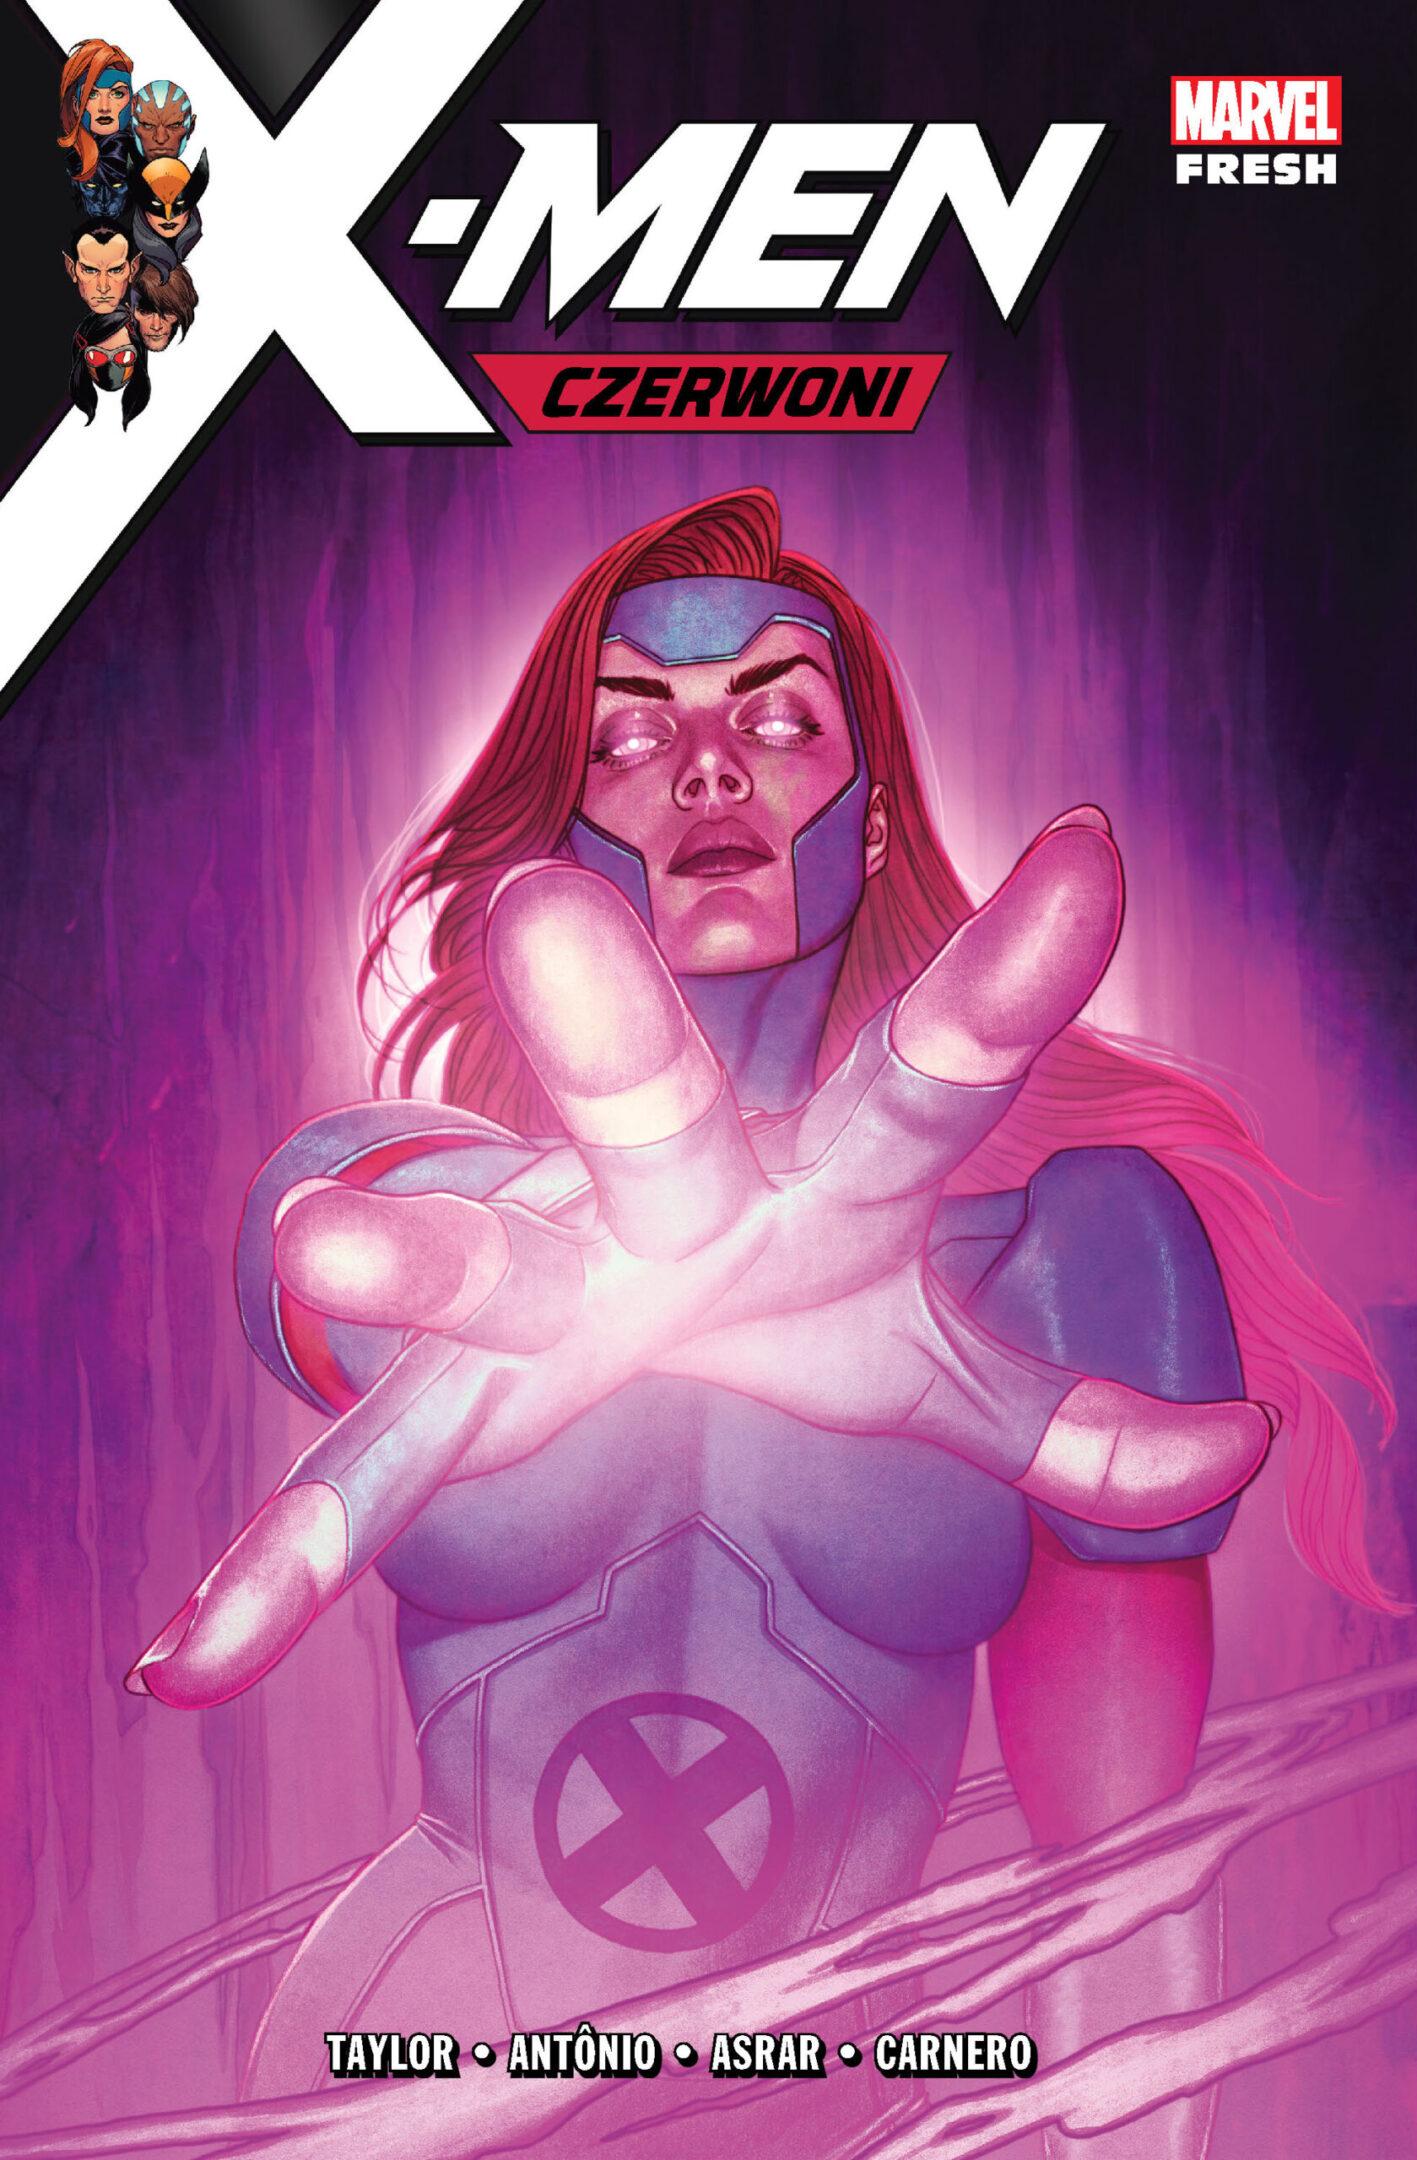 X-Men Czerwoni